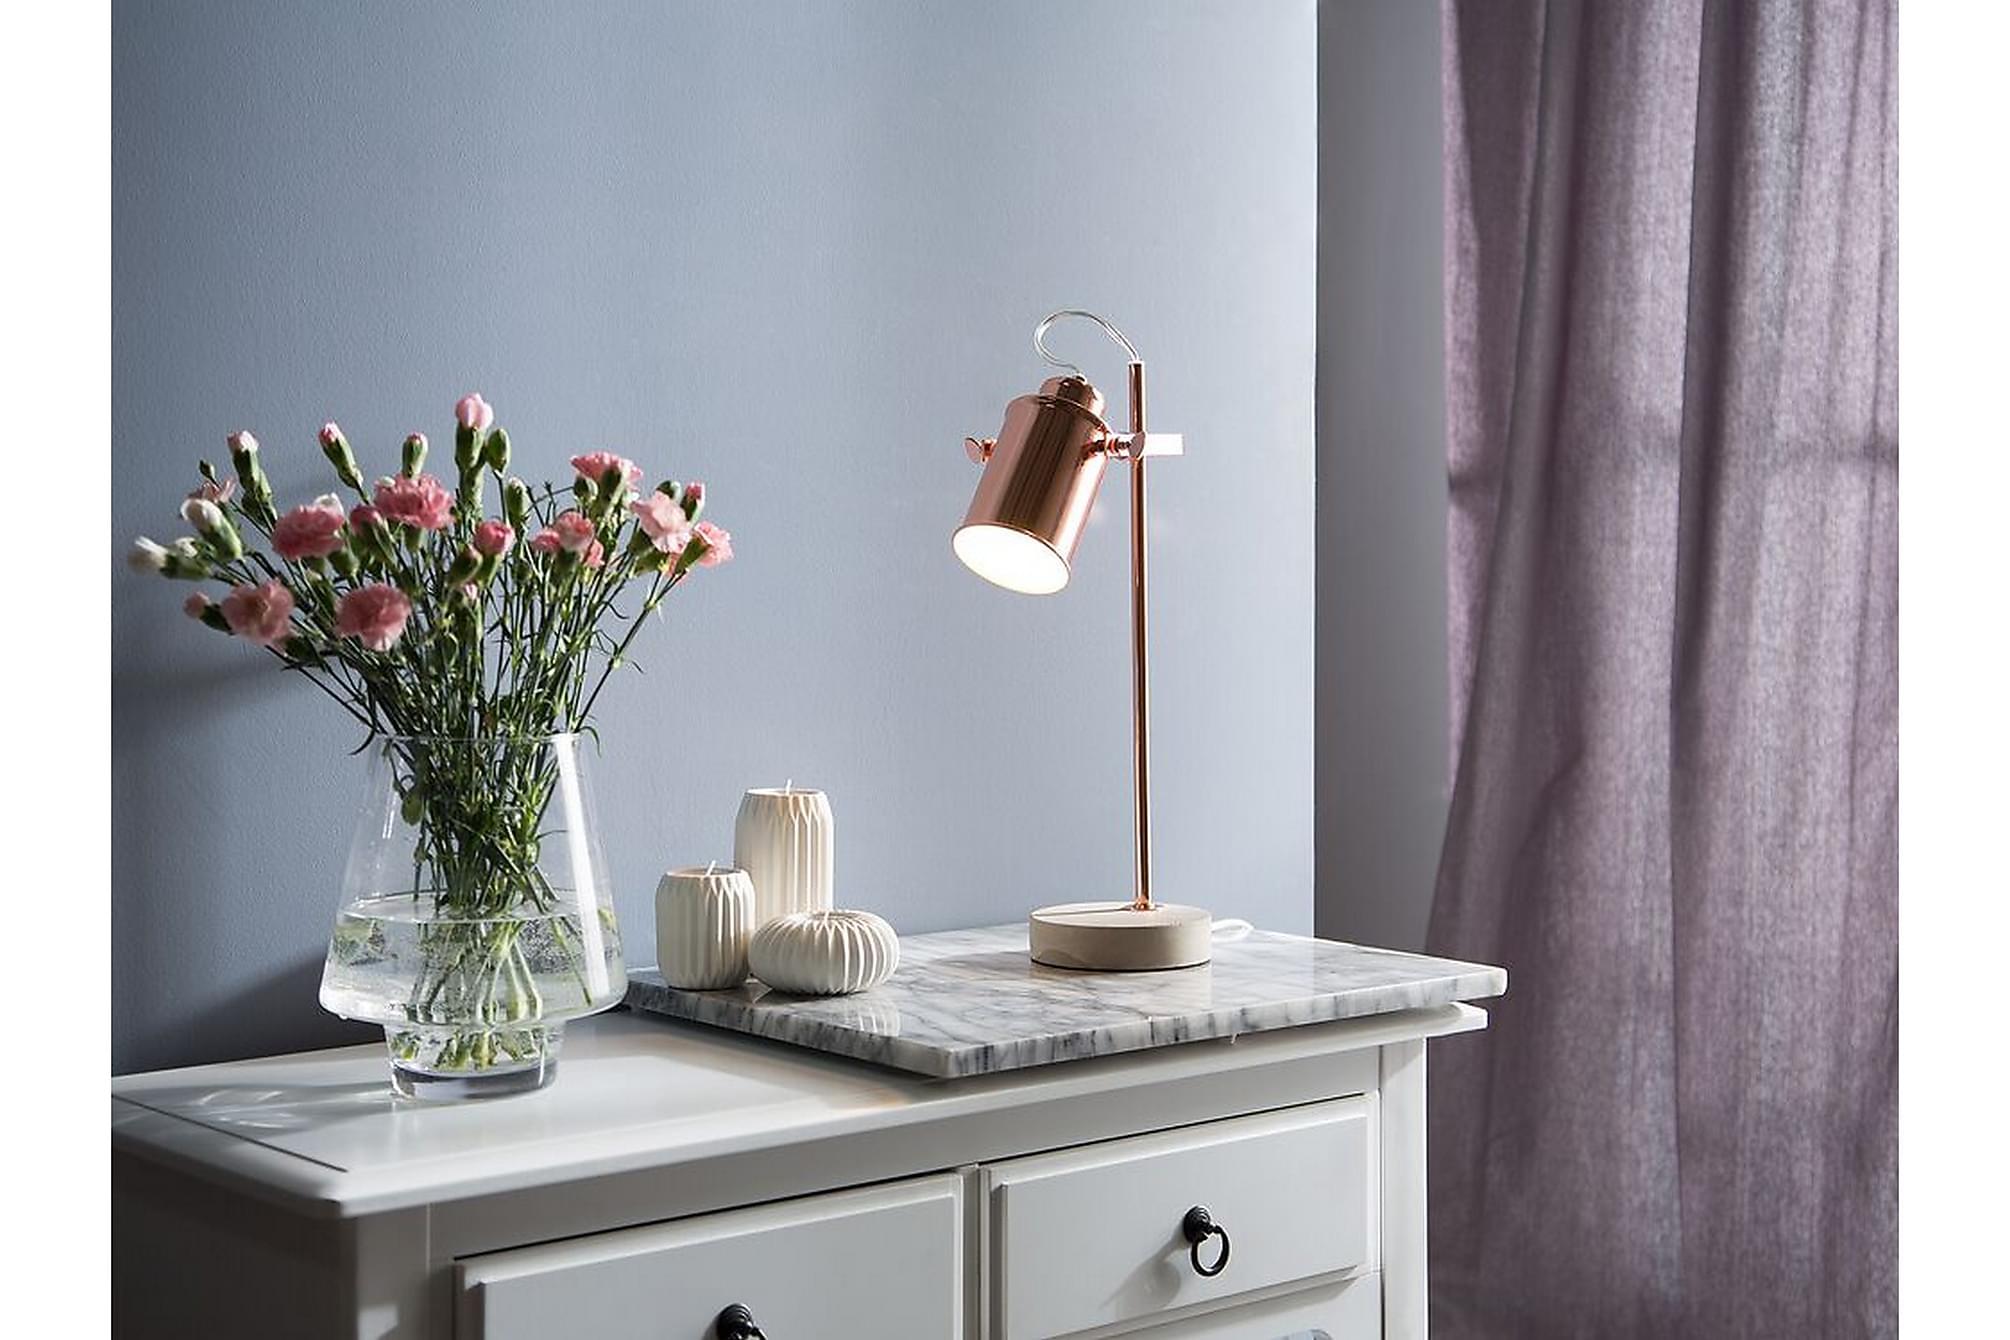 MUNDAKA Bordslampa 13 cm